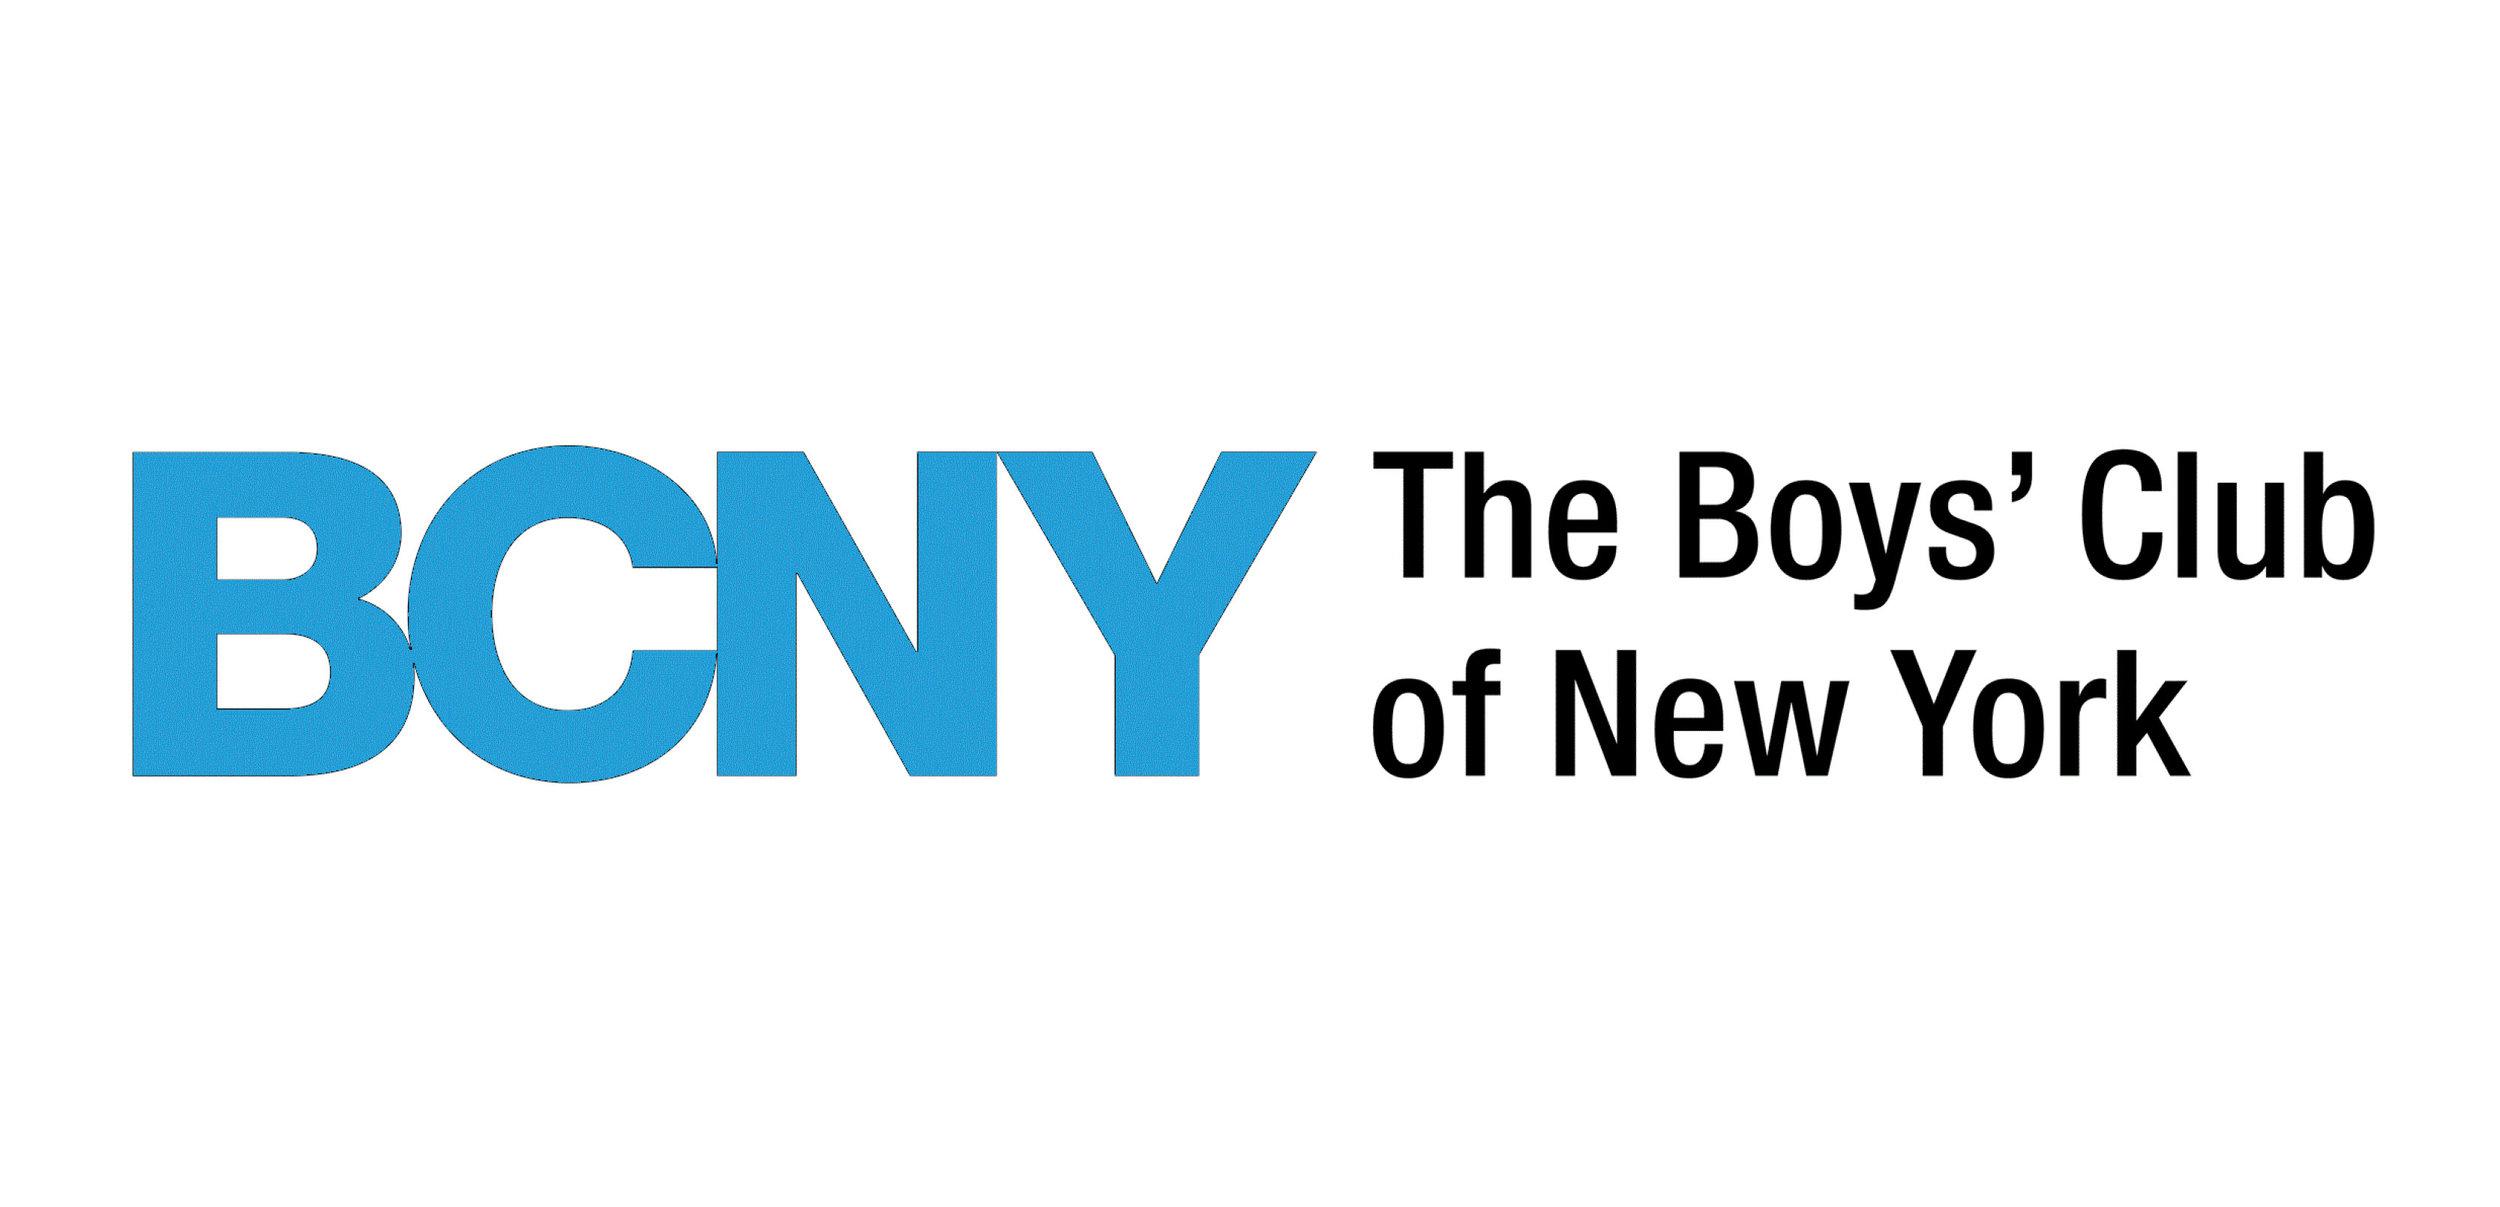 Boys' Club of New York